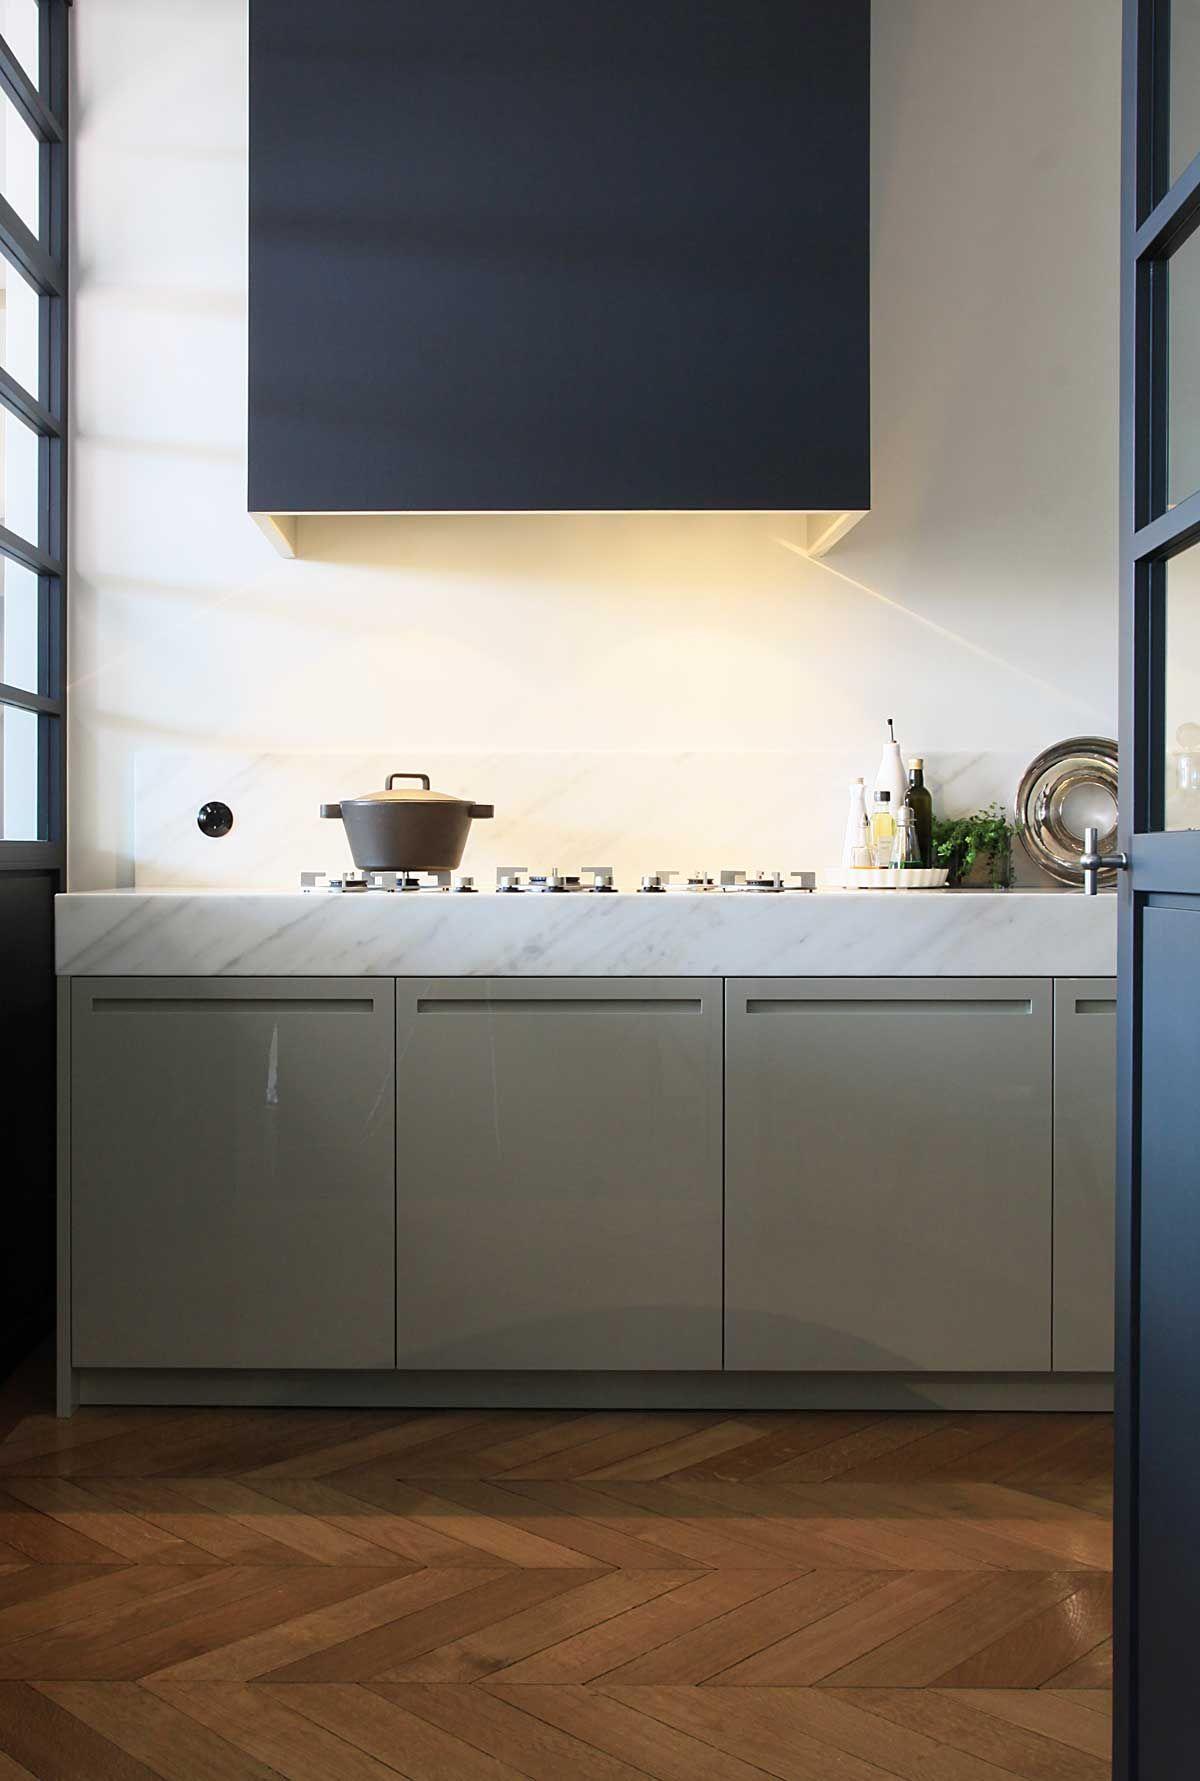 Gray Lower Kitchen Cabinets, Thick Marble Counter, Modern Range Hood,  Herringbone Floors